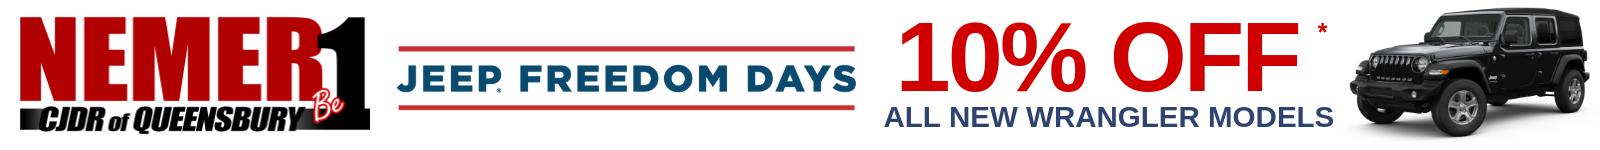 Wrangler Freedom Days